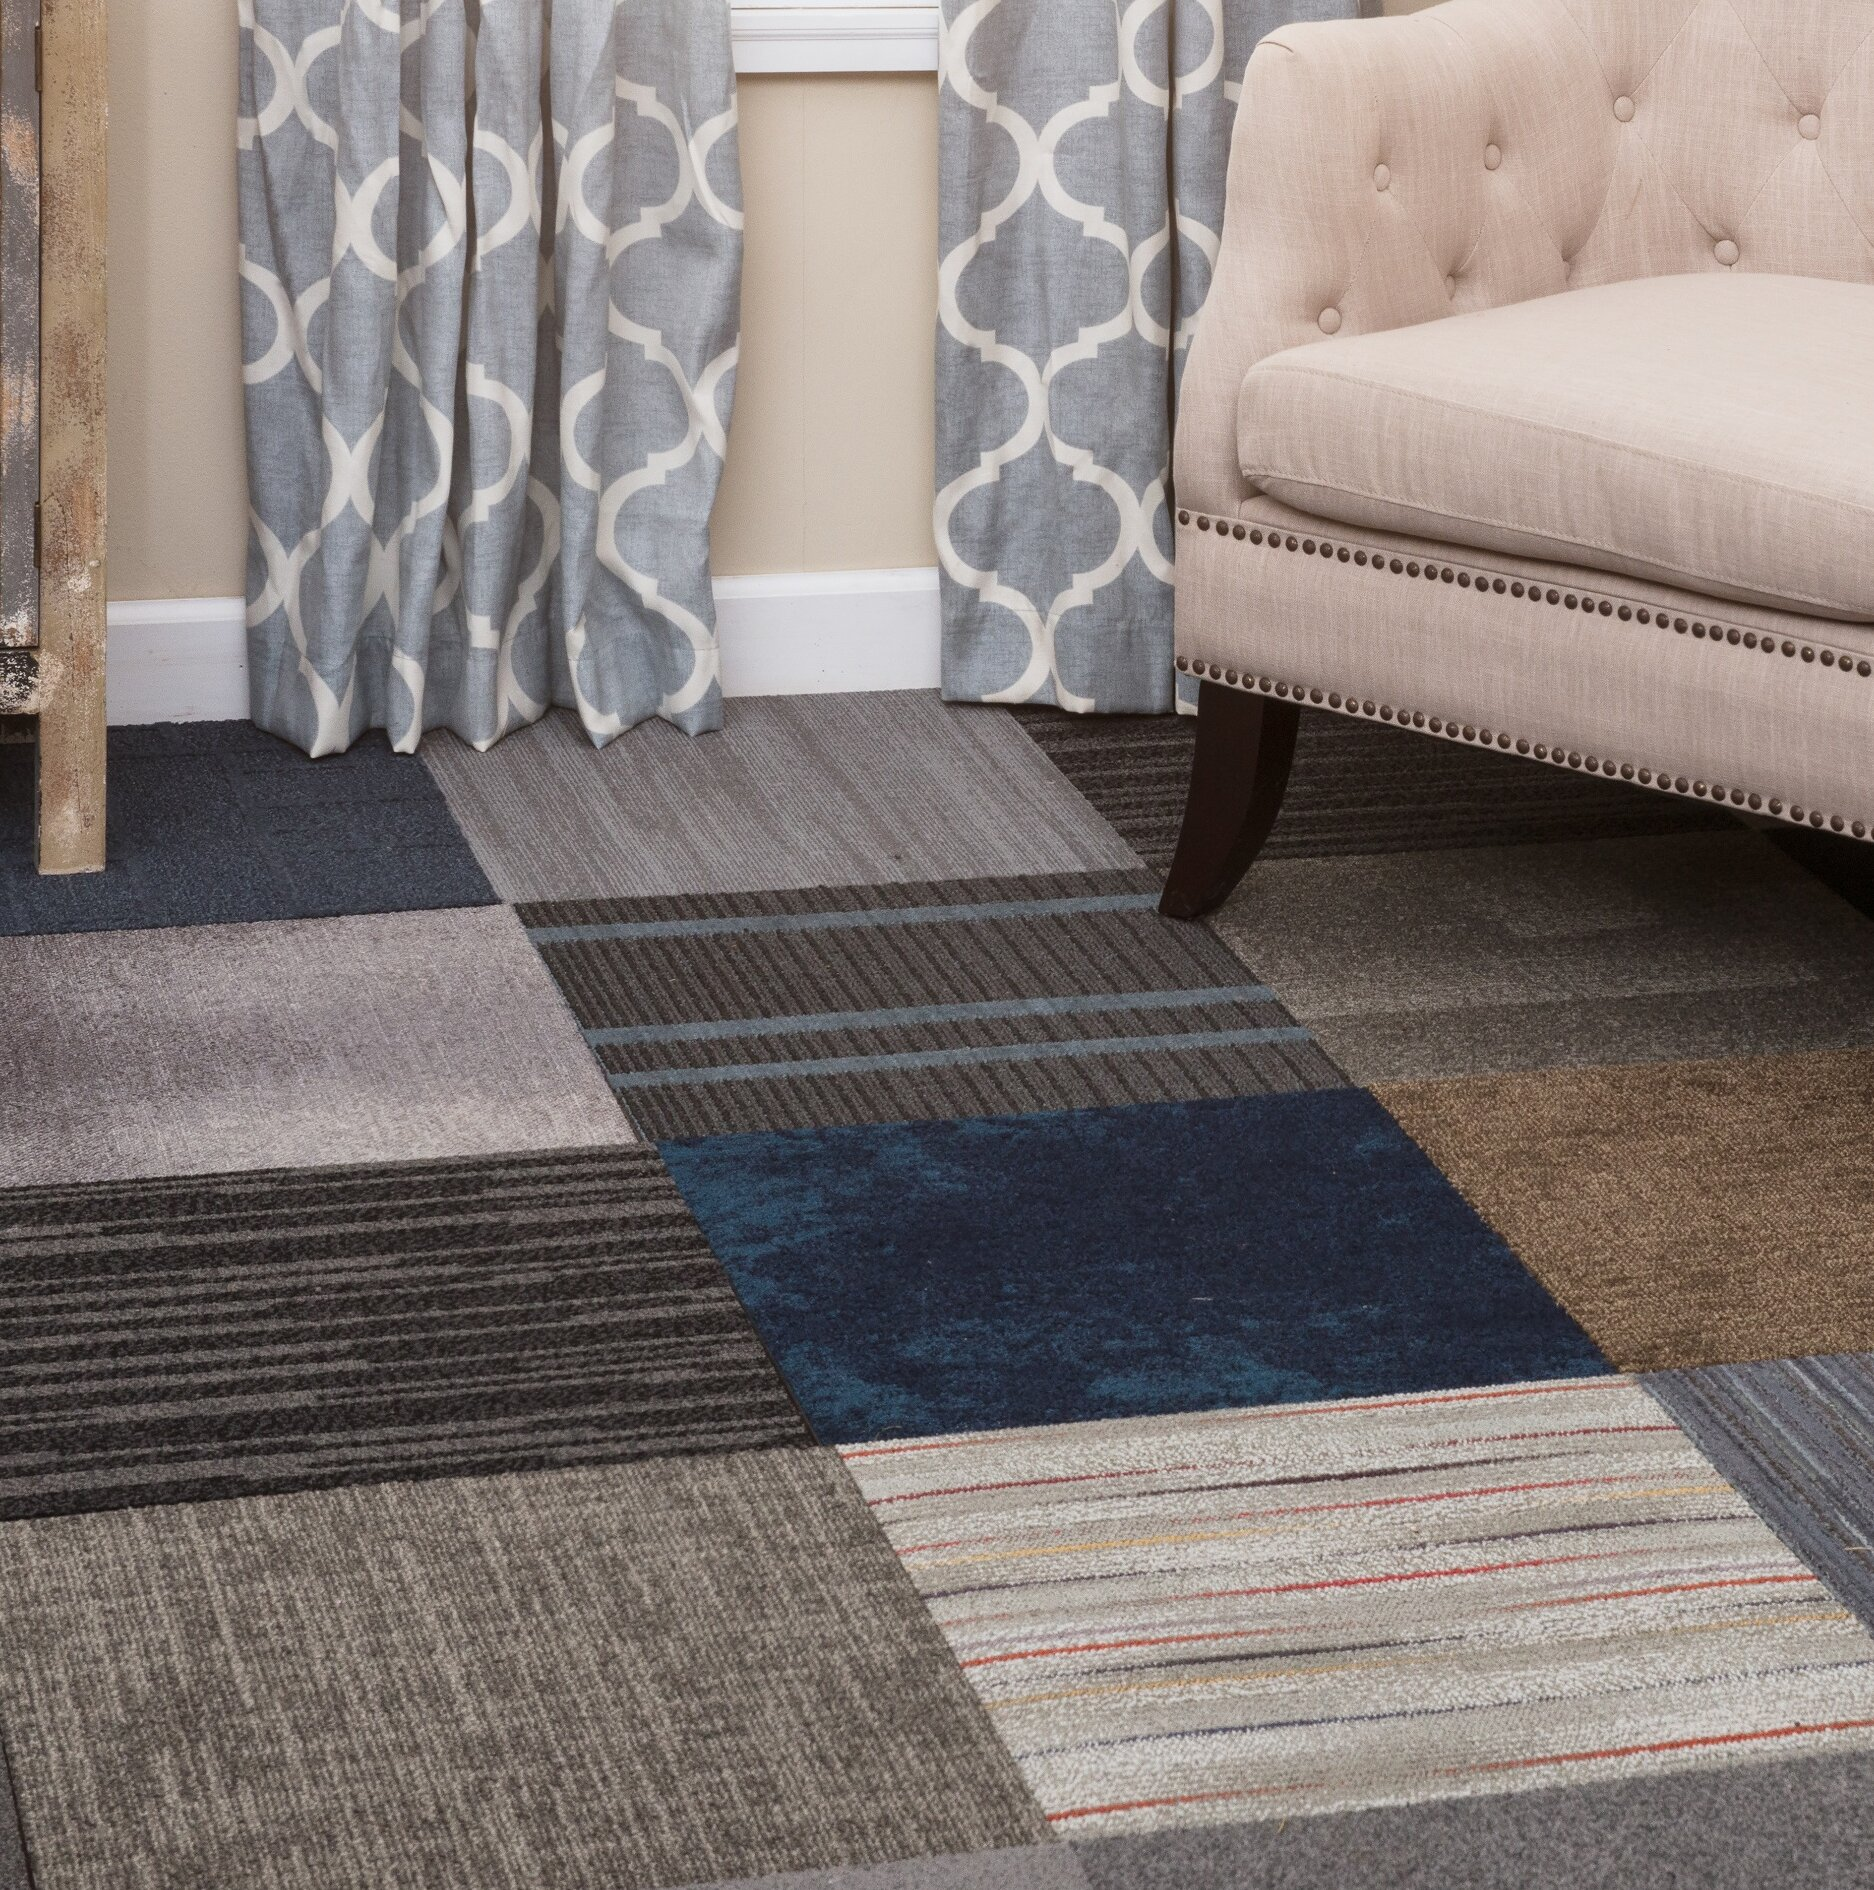 Nance Industries Diy 20 X 20 Plush Cut Peel And Stick Carpet Tile Reviews Wayfair